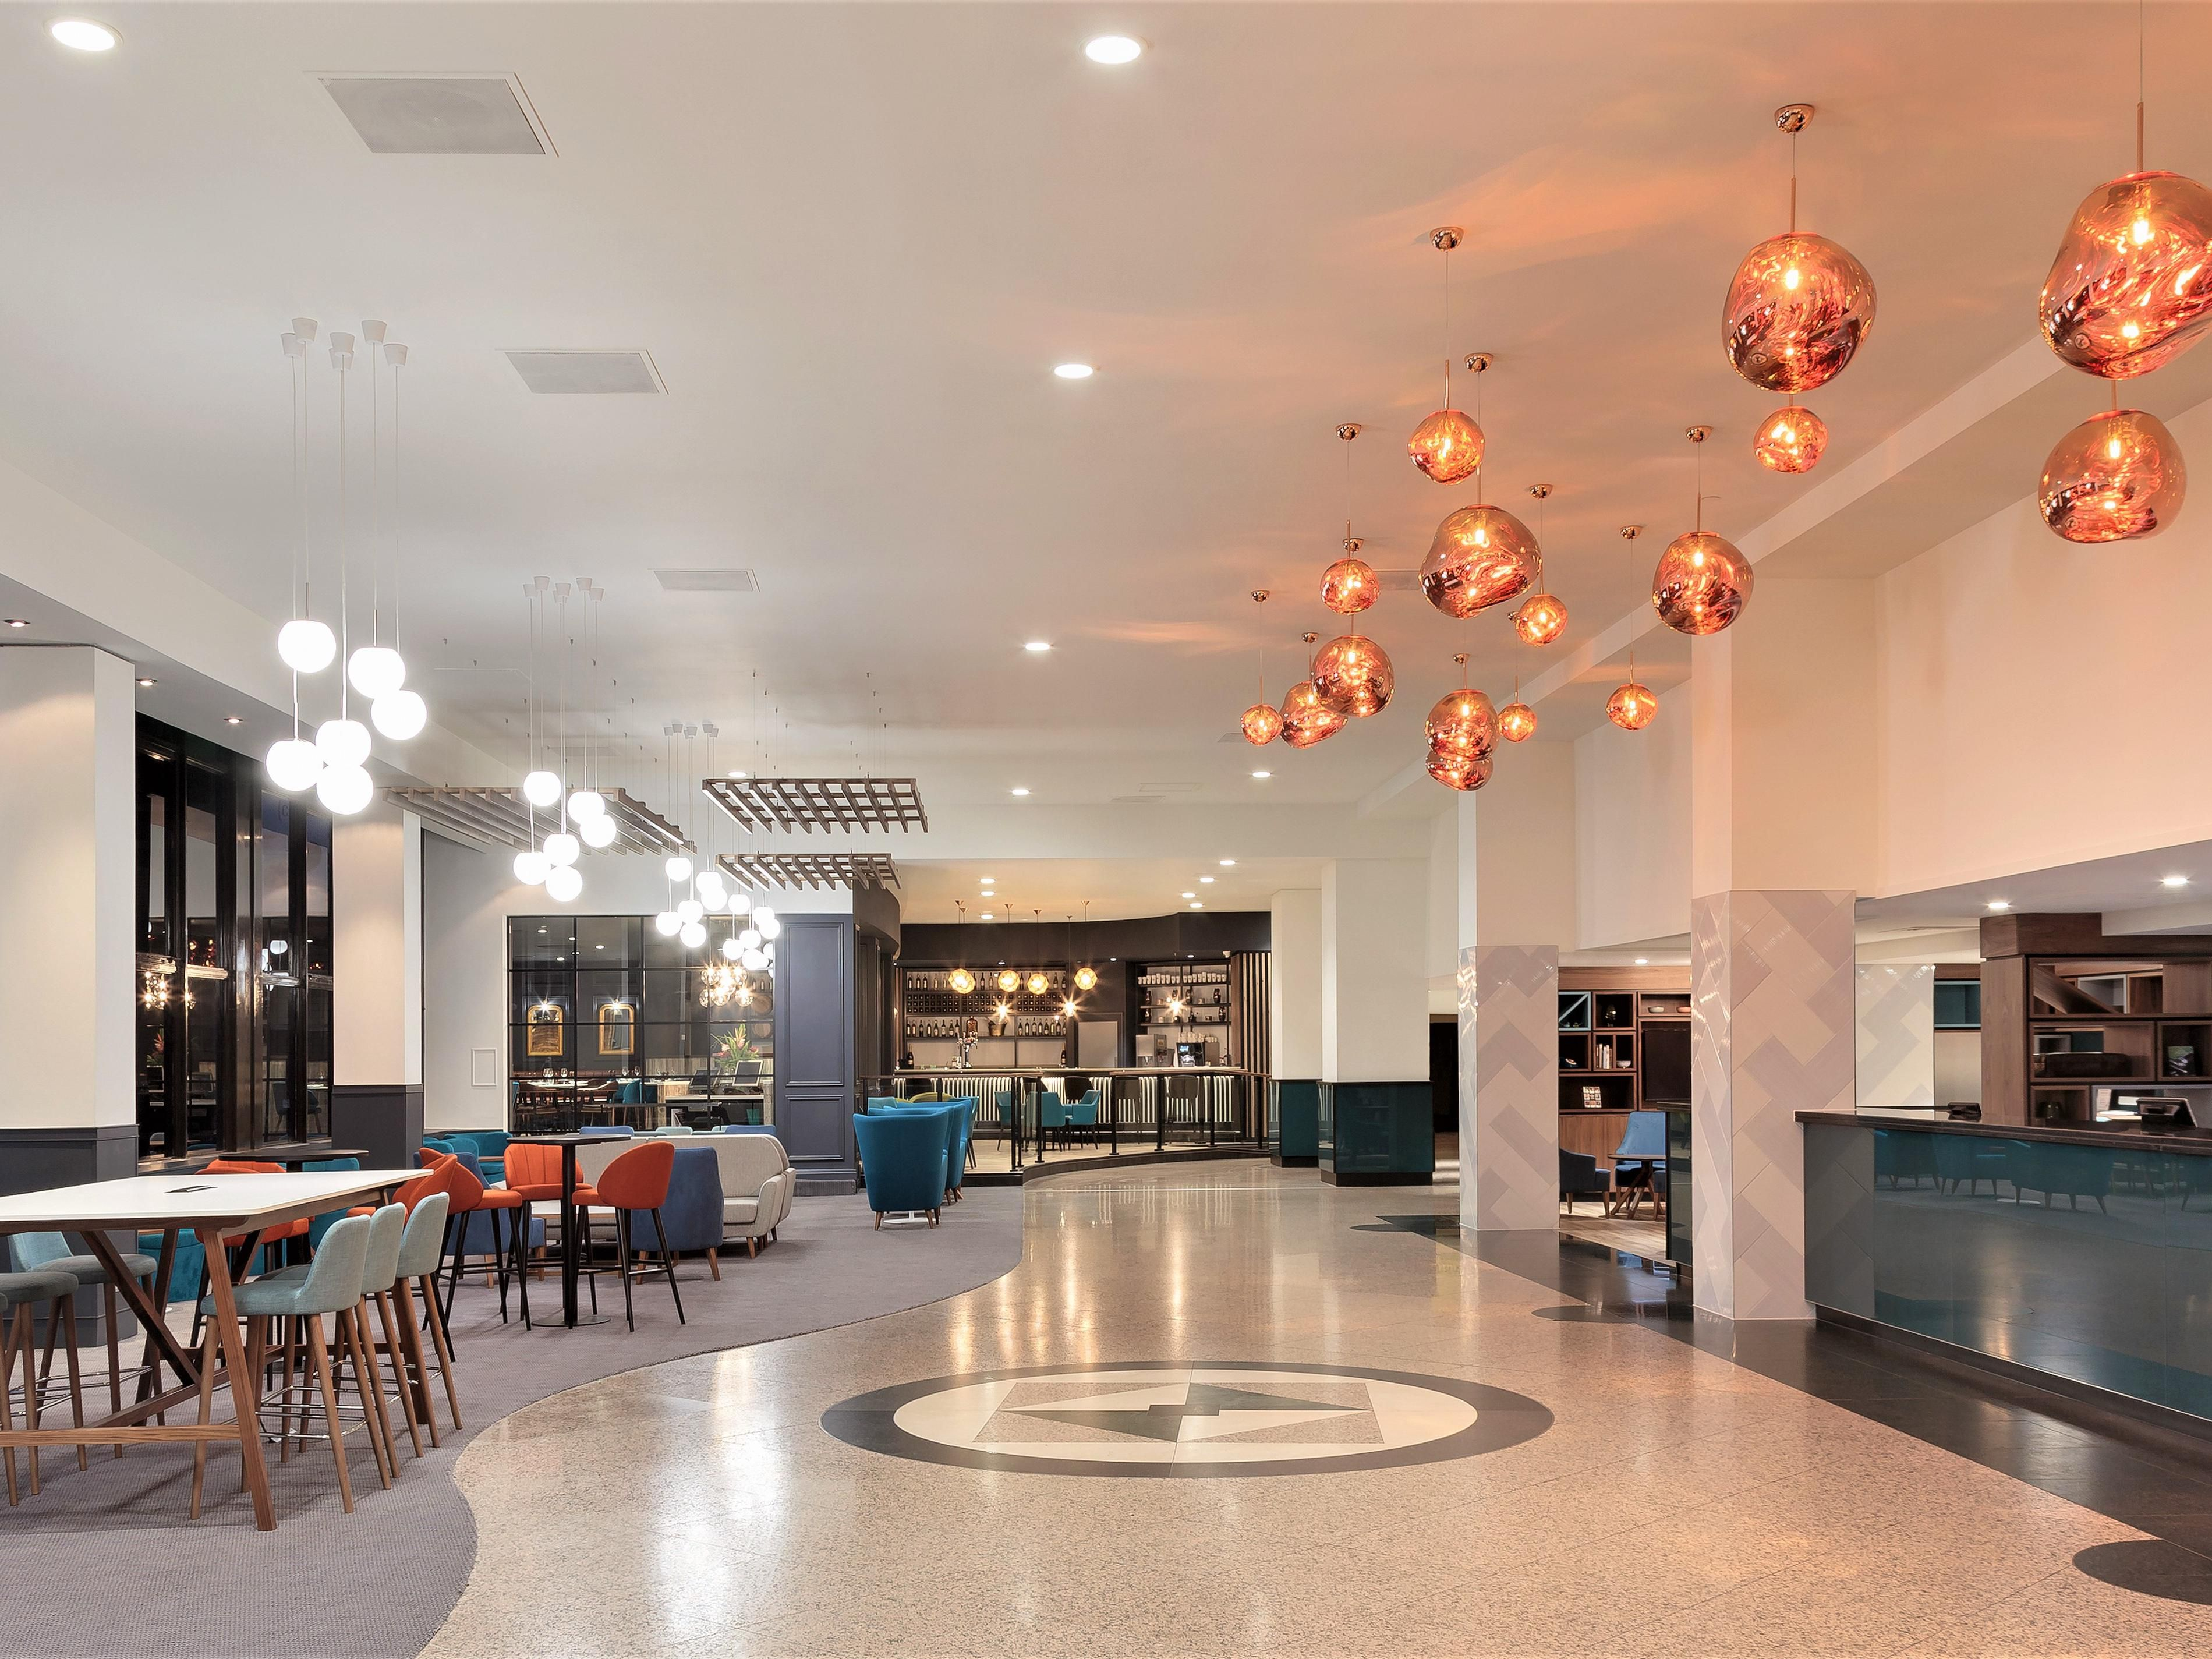 West London Hotel Holiday Inn London Kensington Forum